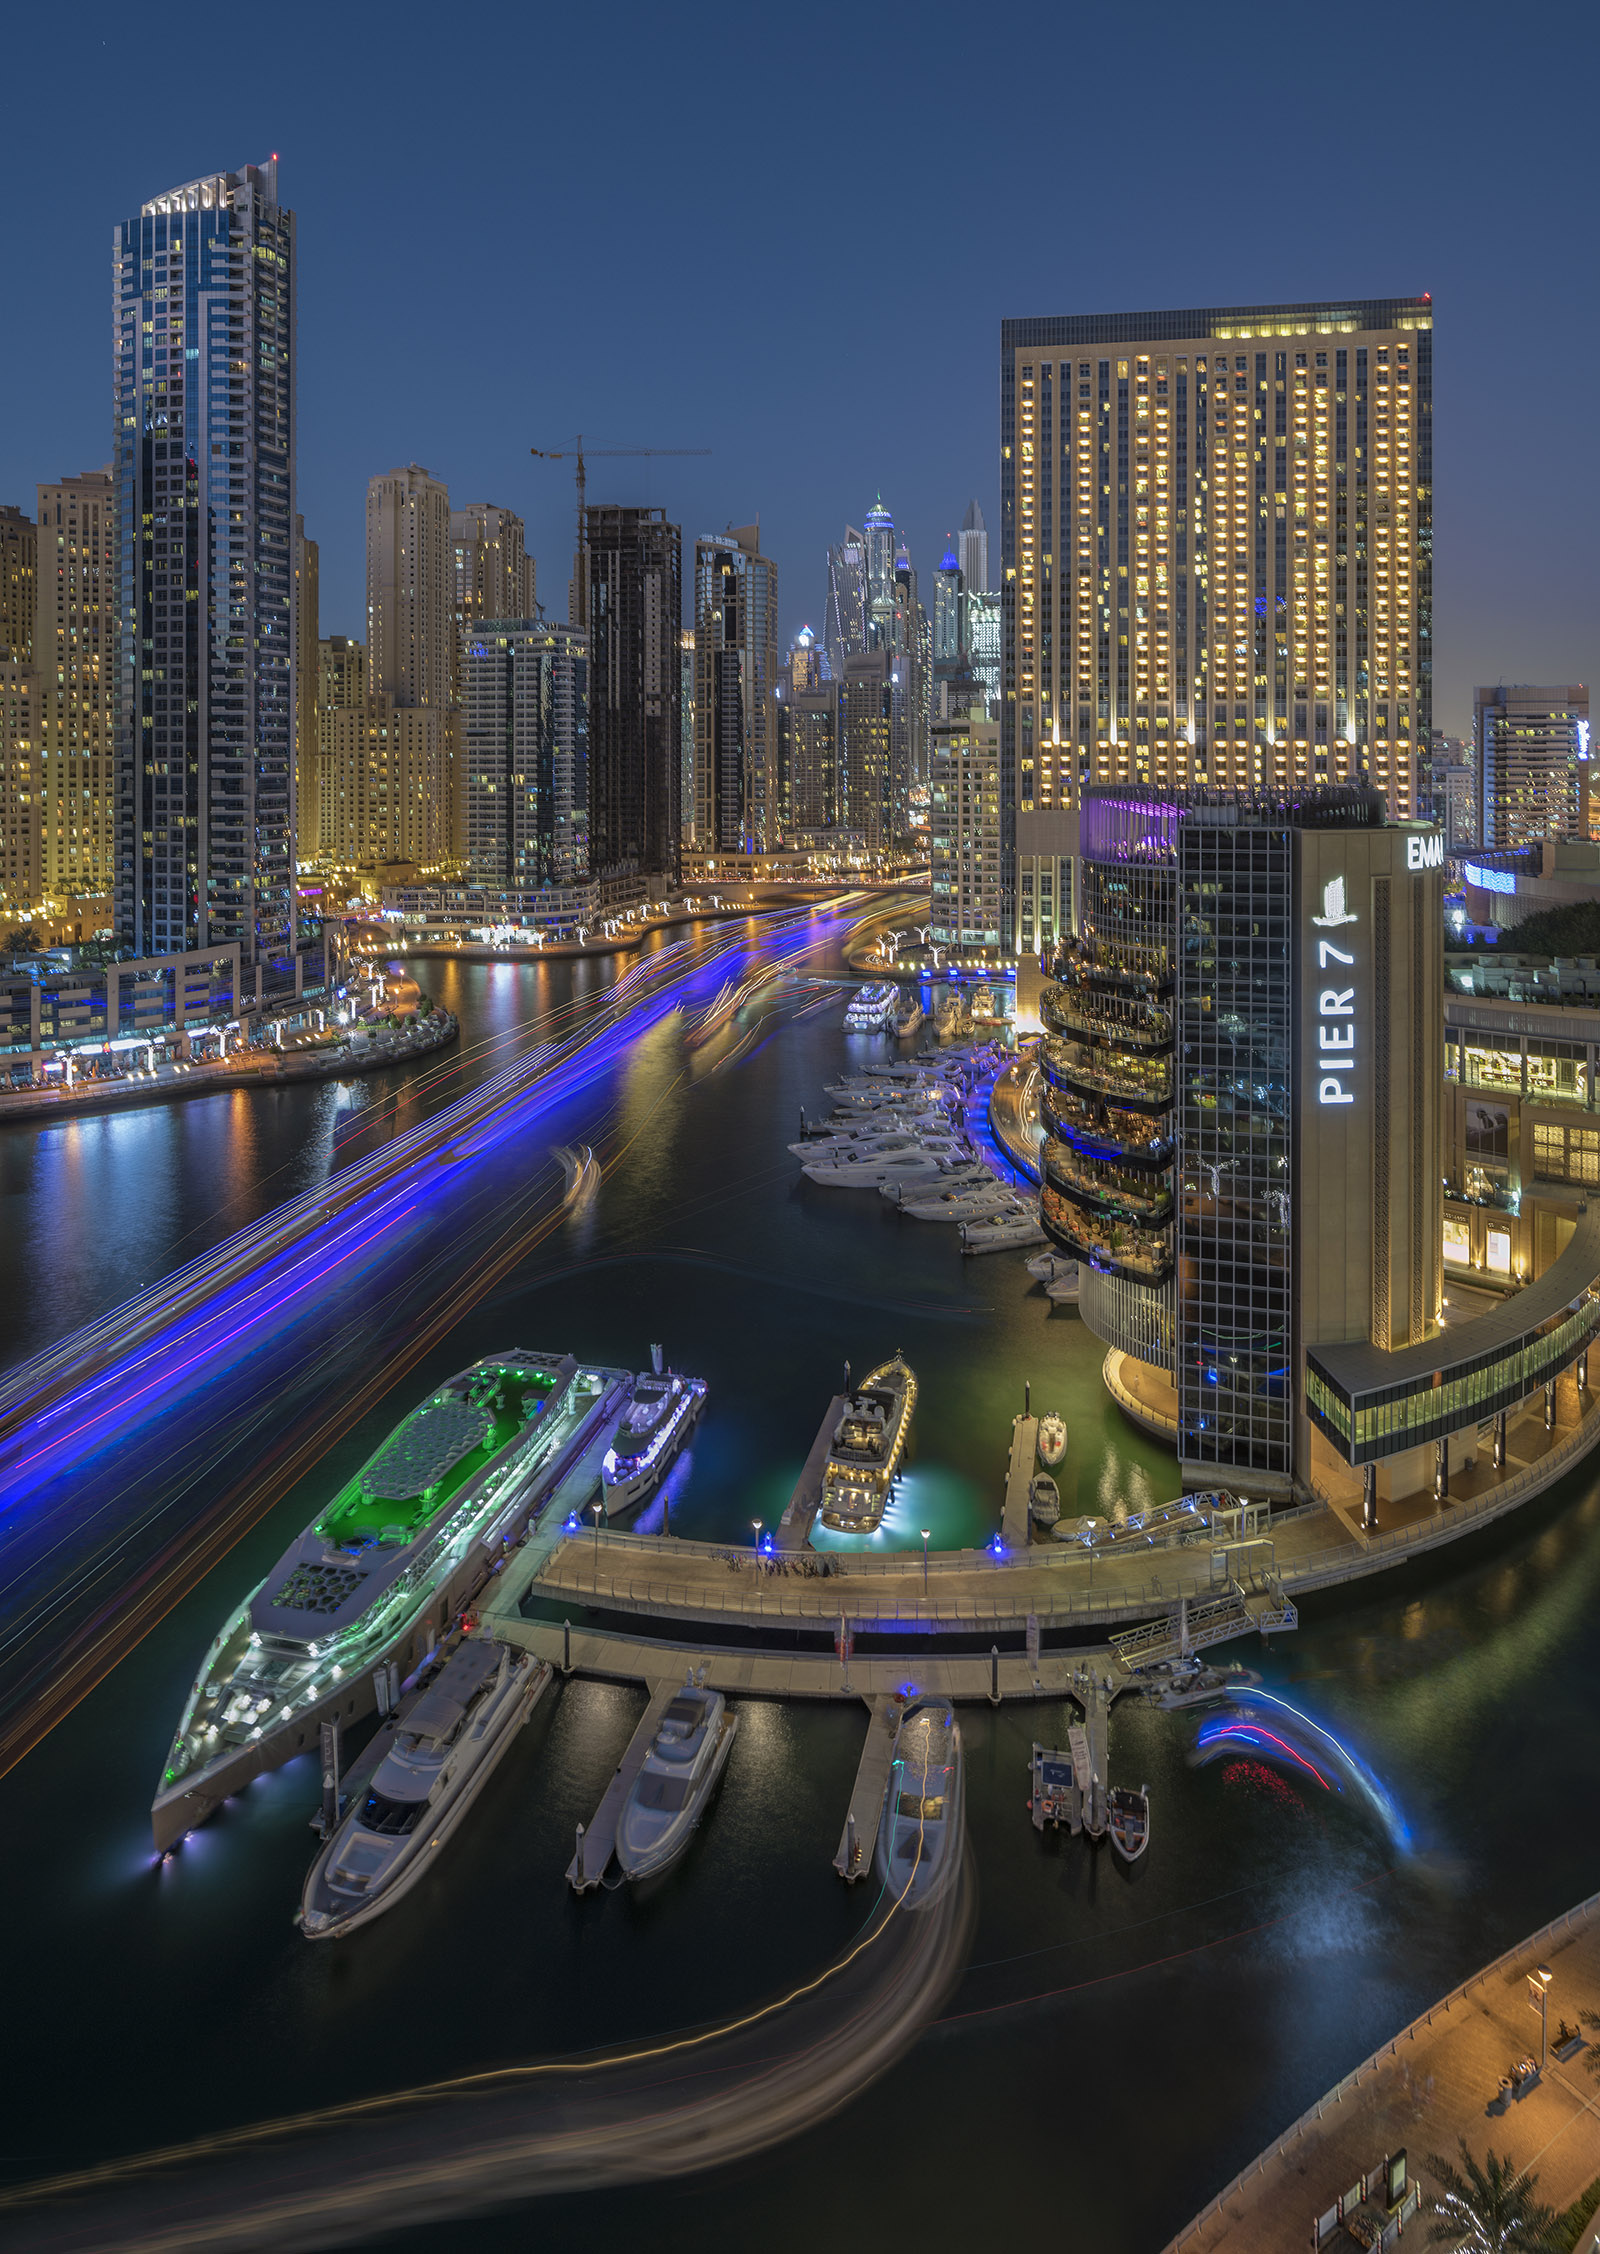 Blue hour at the Dubai Marina